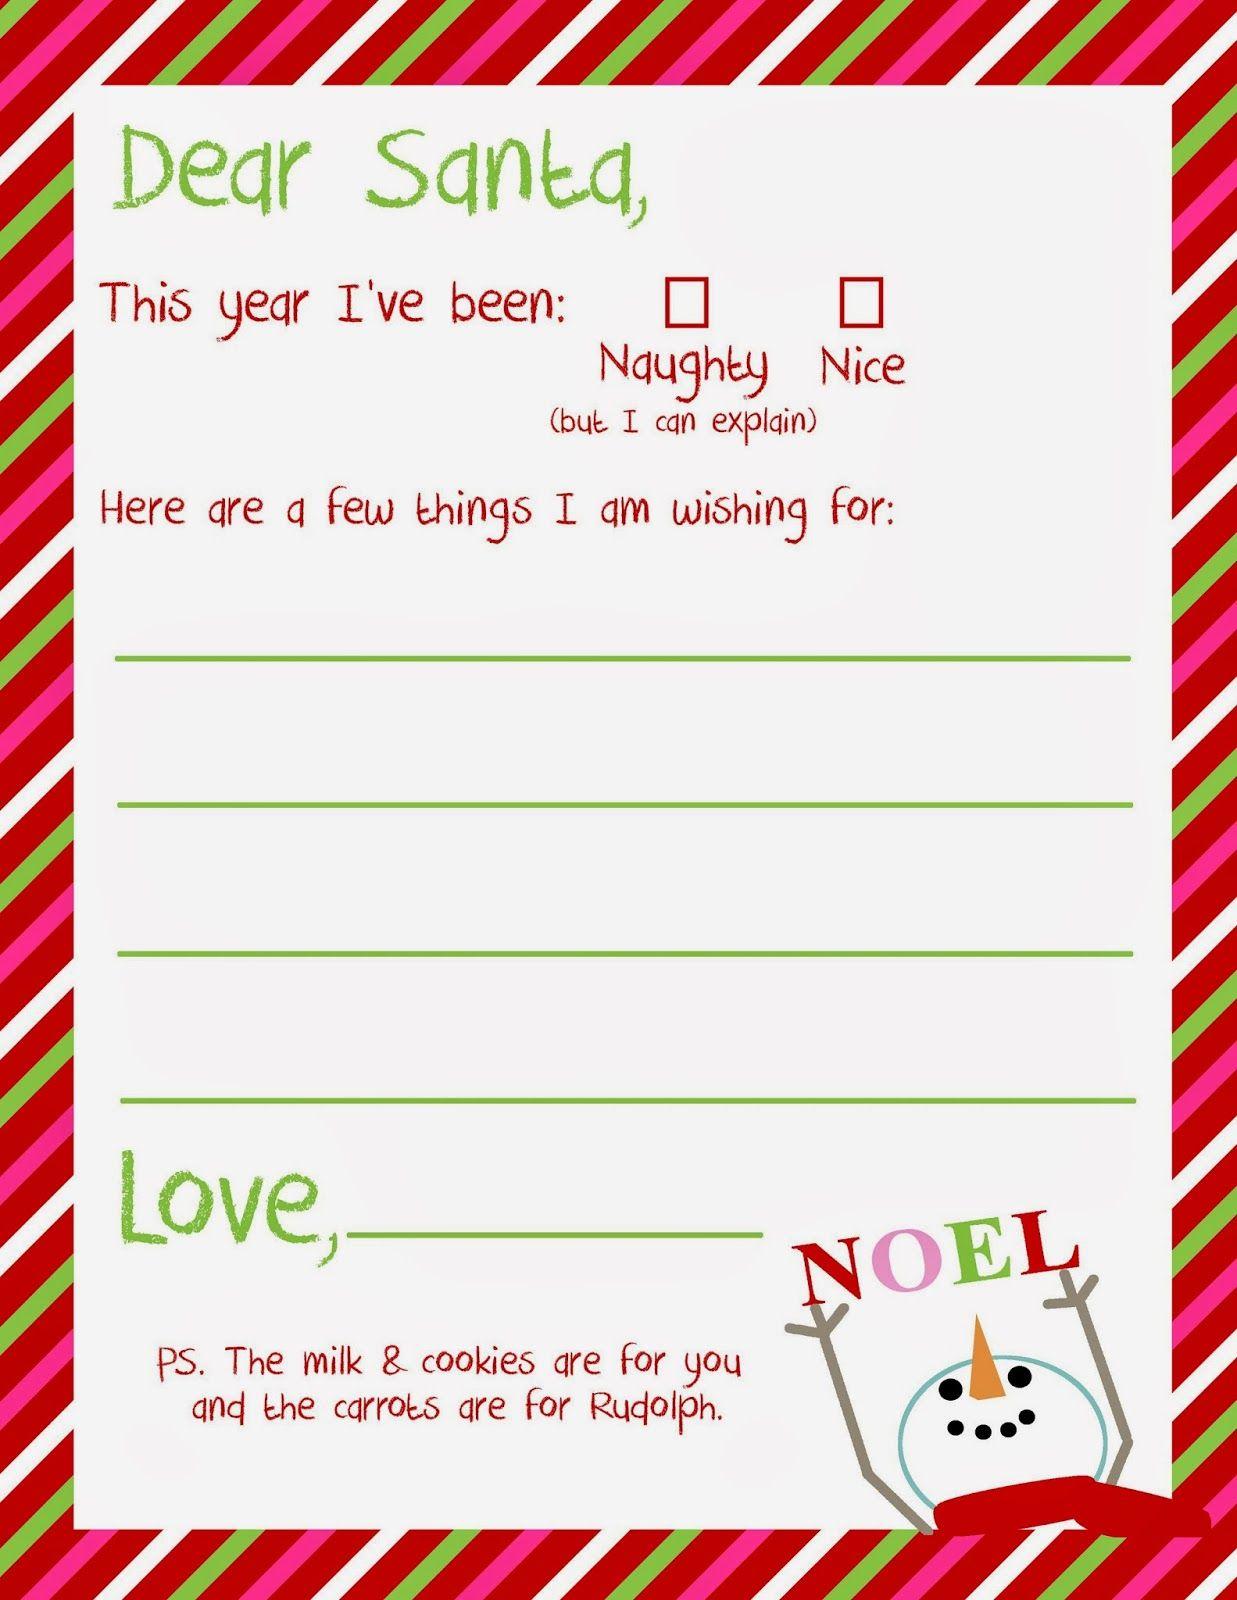 Dear Santa Letter Printable Santa letter printable, Dear